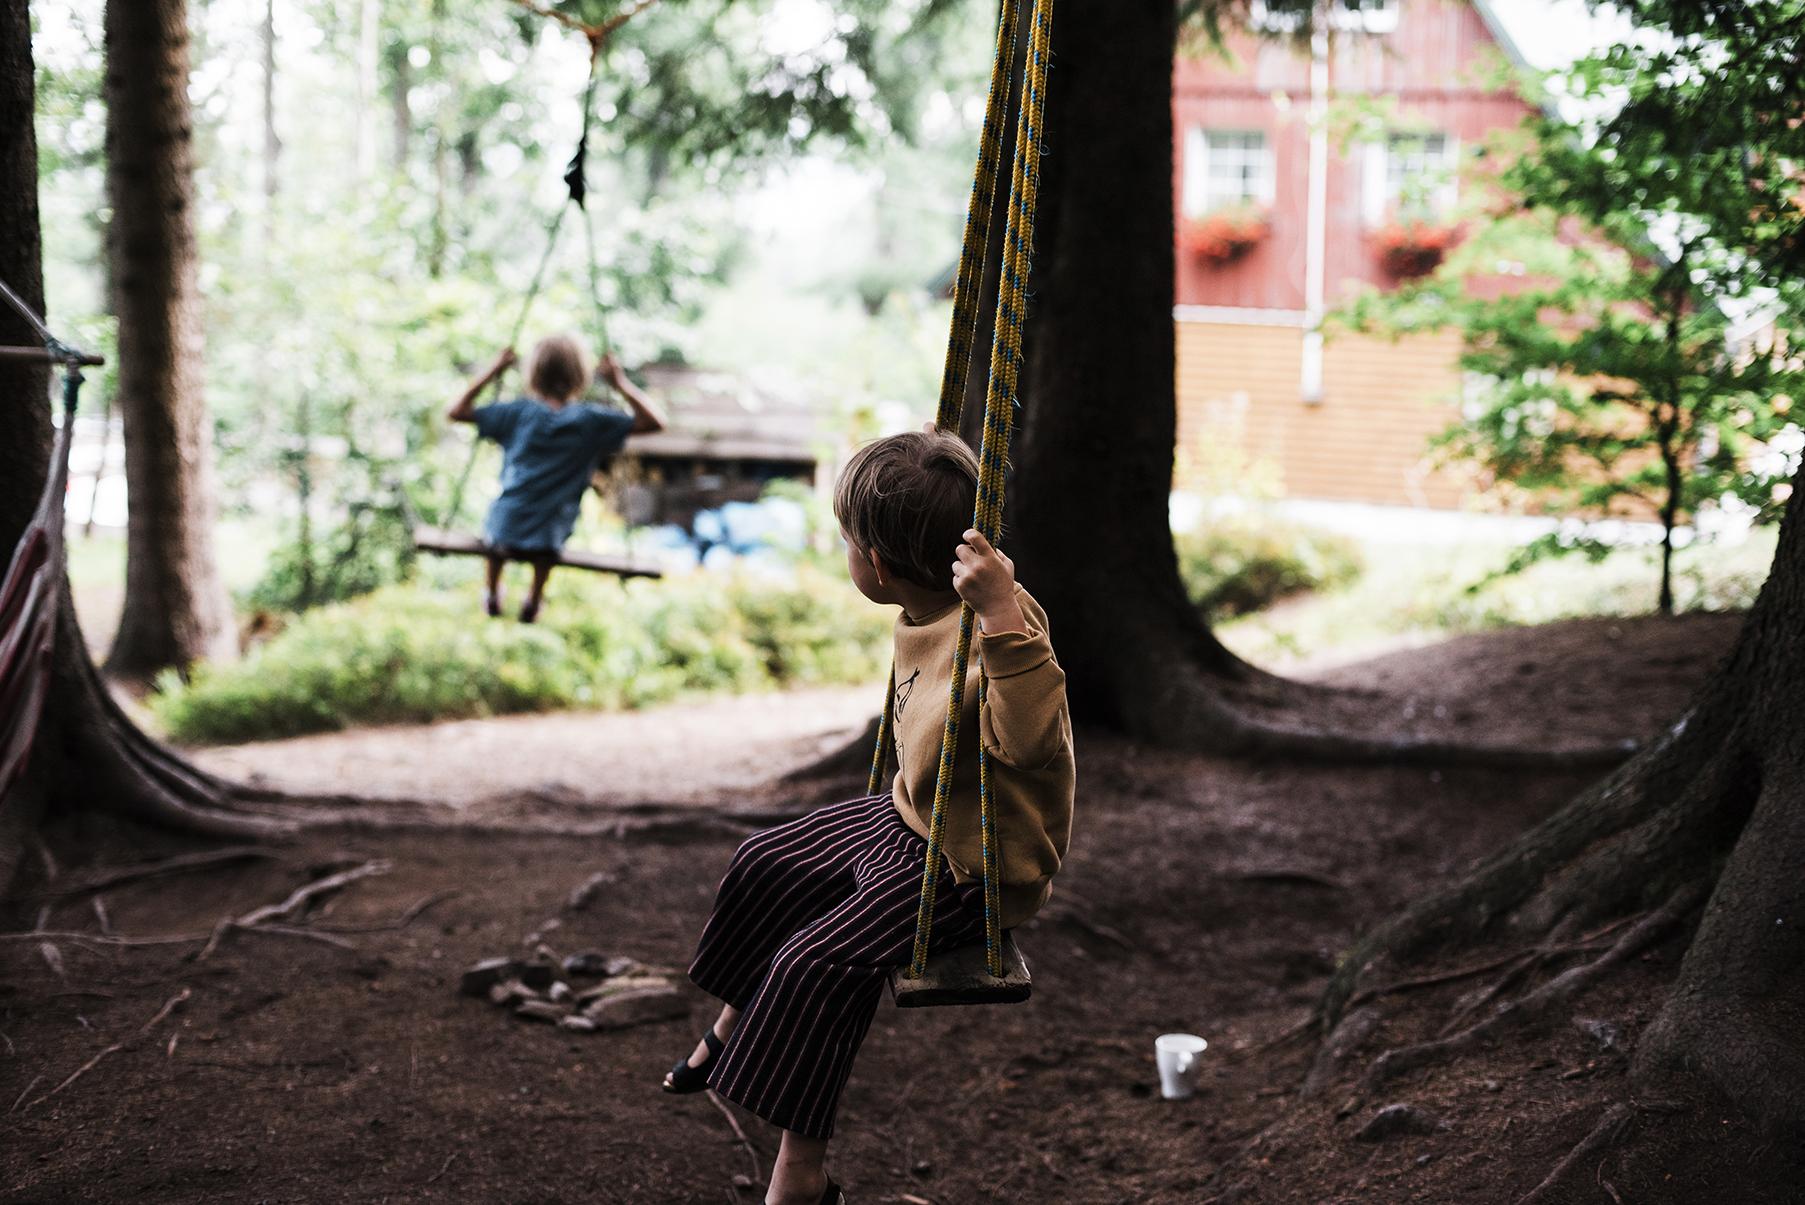 Leśne Apartamenty Strażnica - What's there for children?